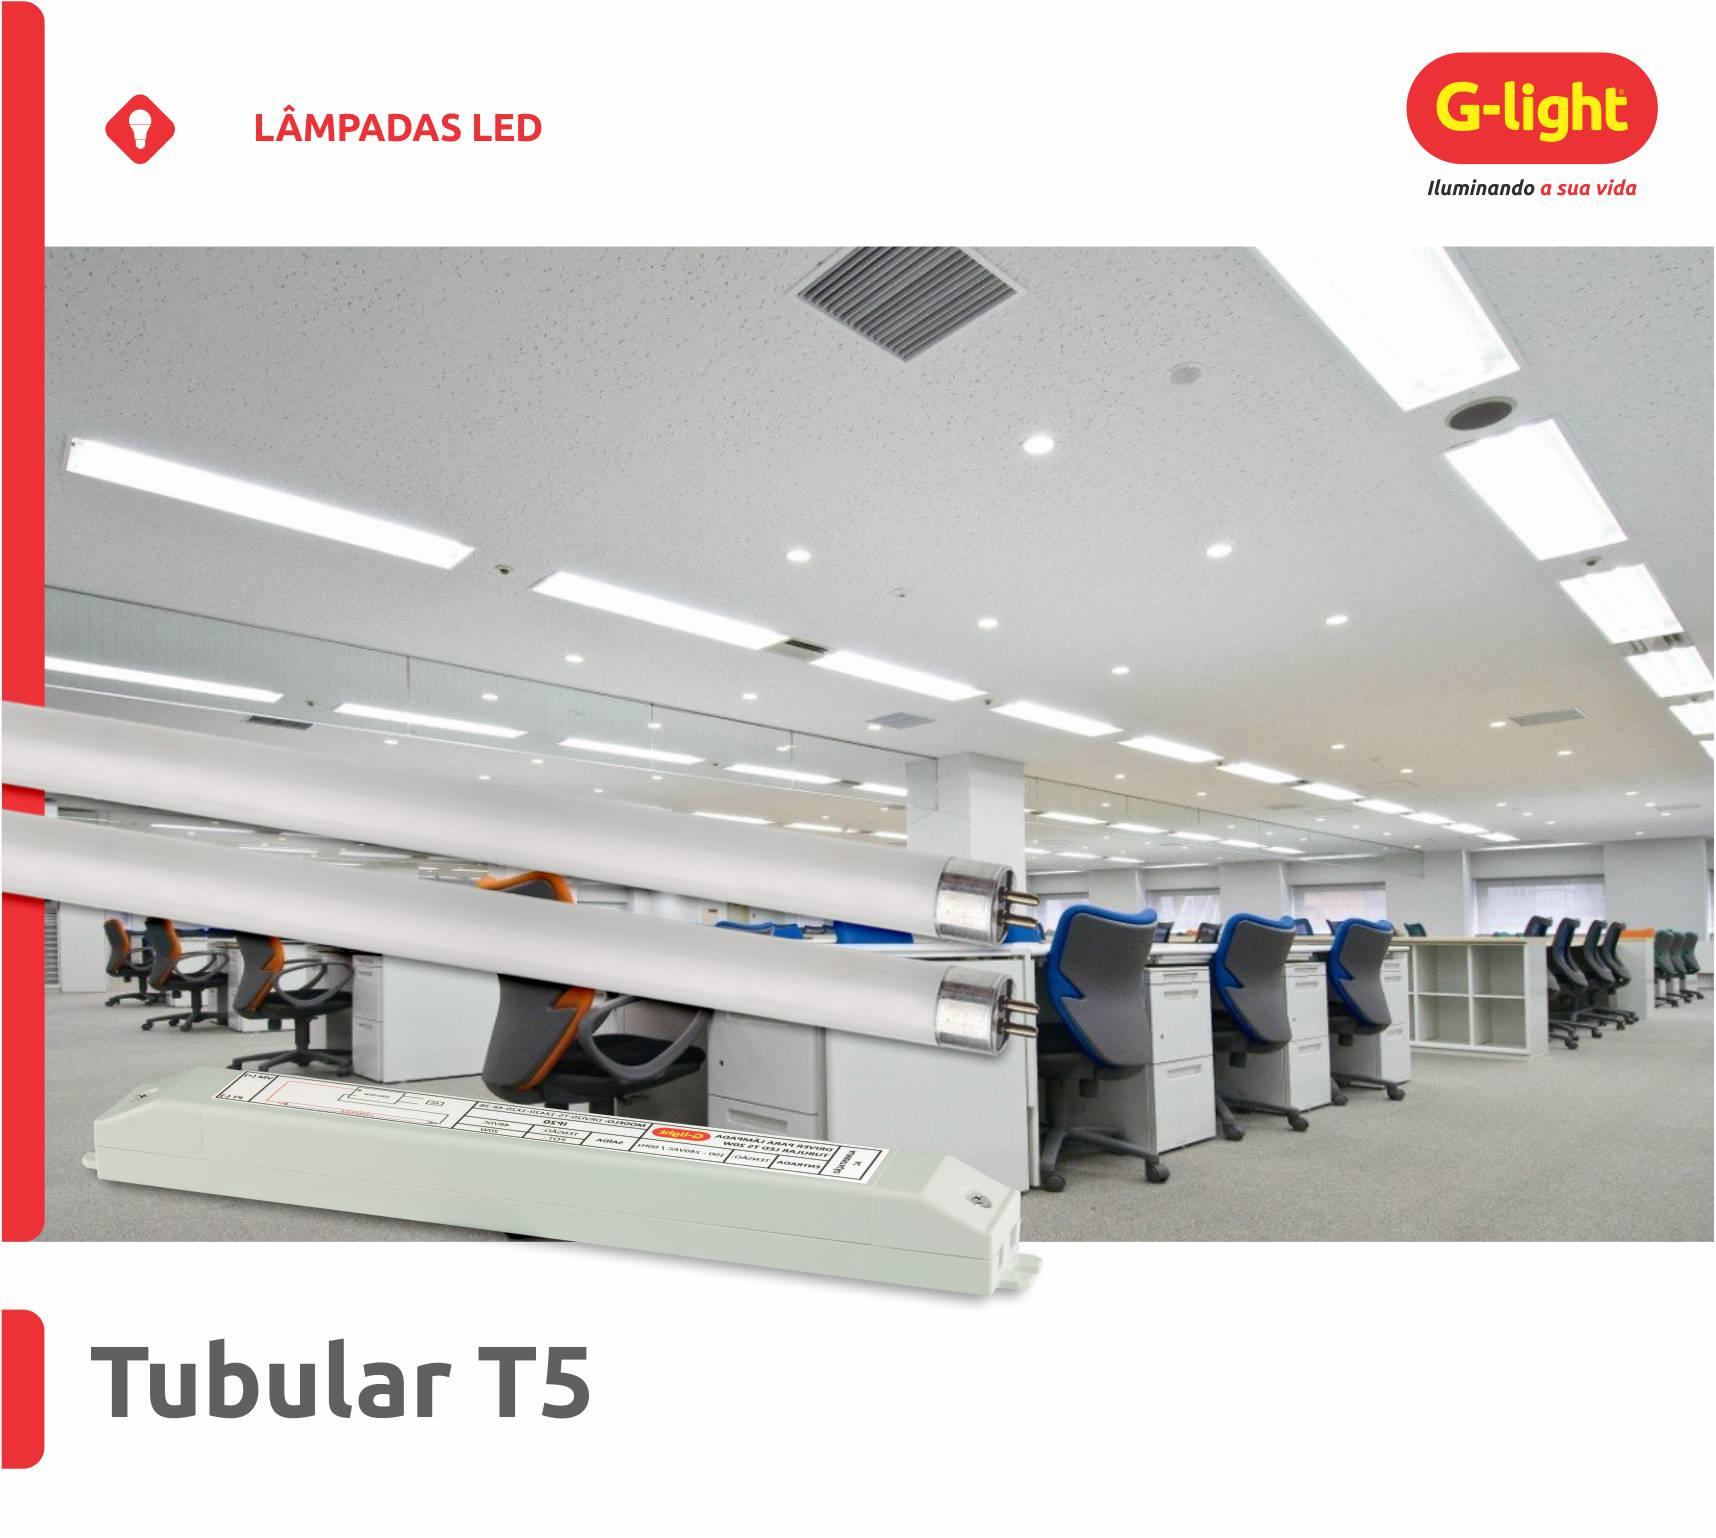 Lâmpadas Tubulares LED T5